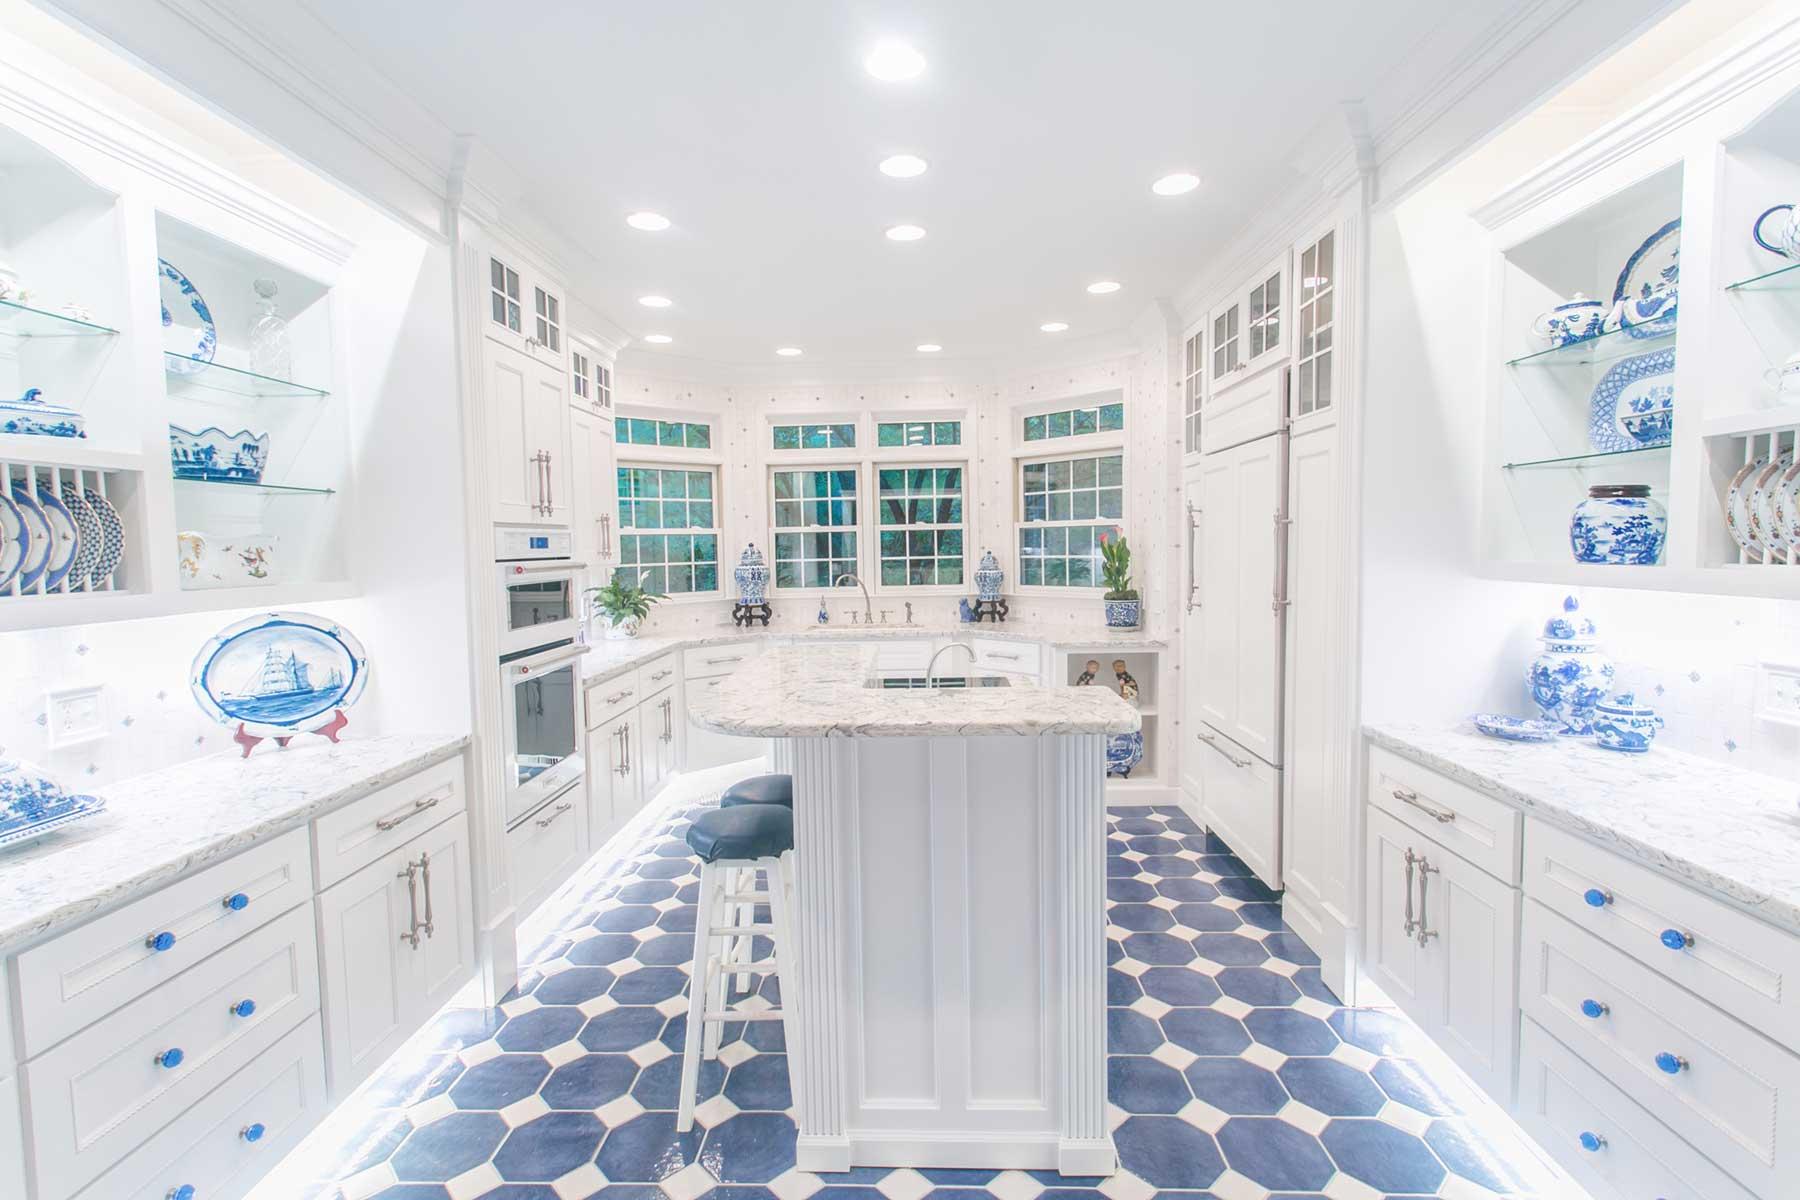 Interior Design Remodeling Johnson City TN The Property Experts - Bathroom remodel johnson city tn